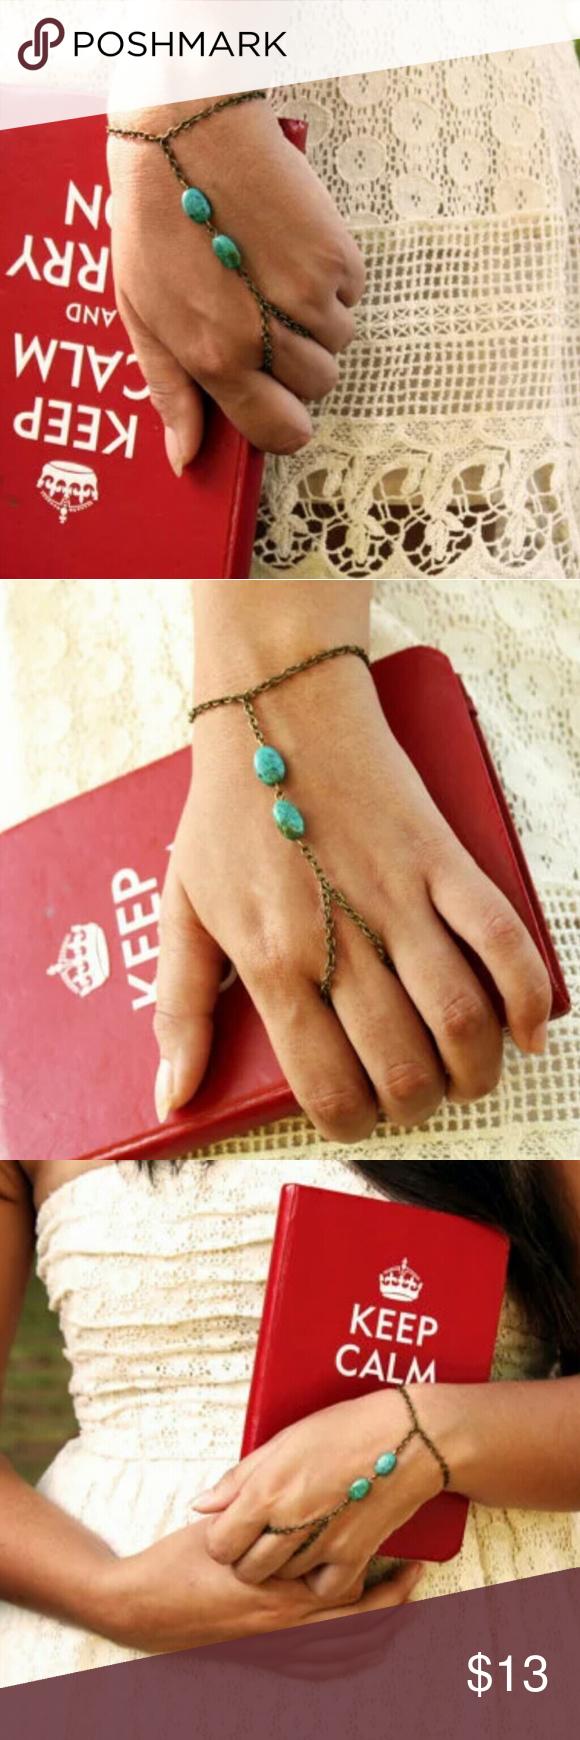 Boho slave bracelet Brand new in original packaging . bundle and save 20% Jewelry Bracelets